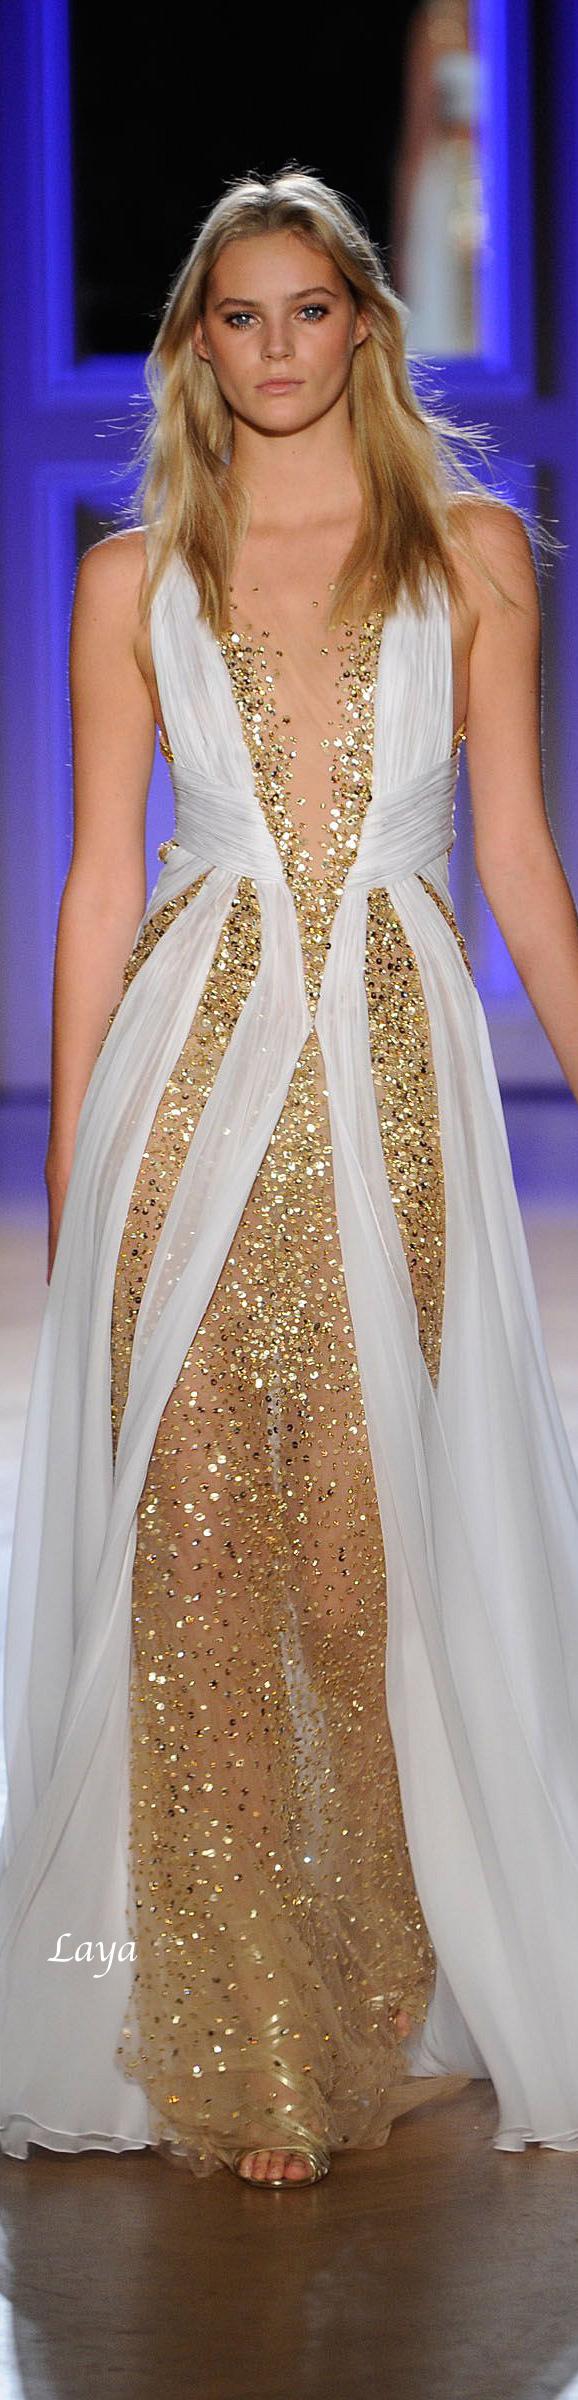 Zuhair murad springsummer couture style inspiration